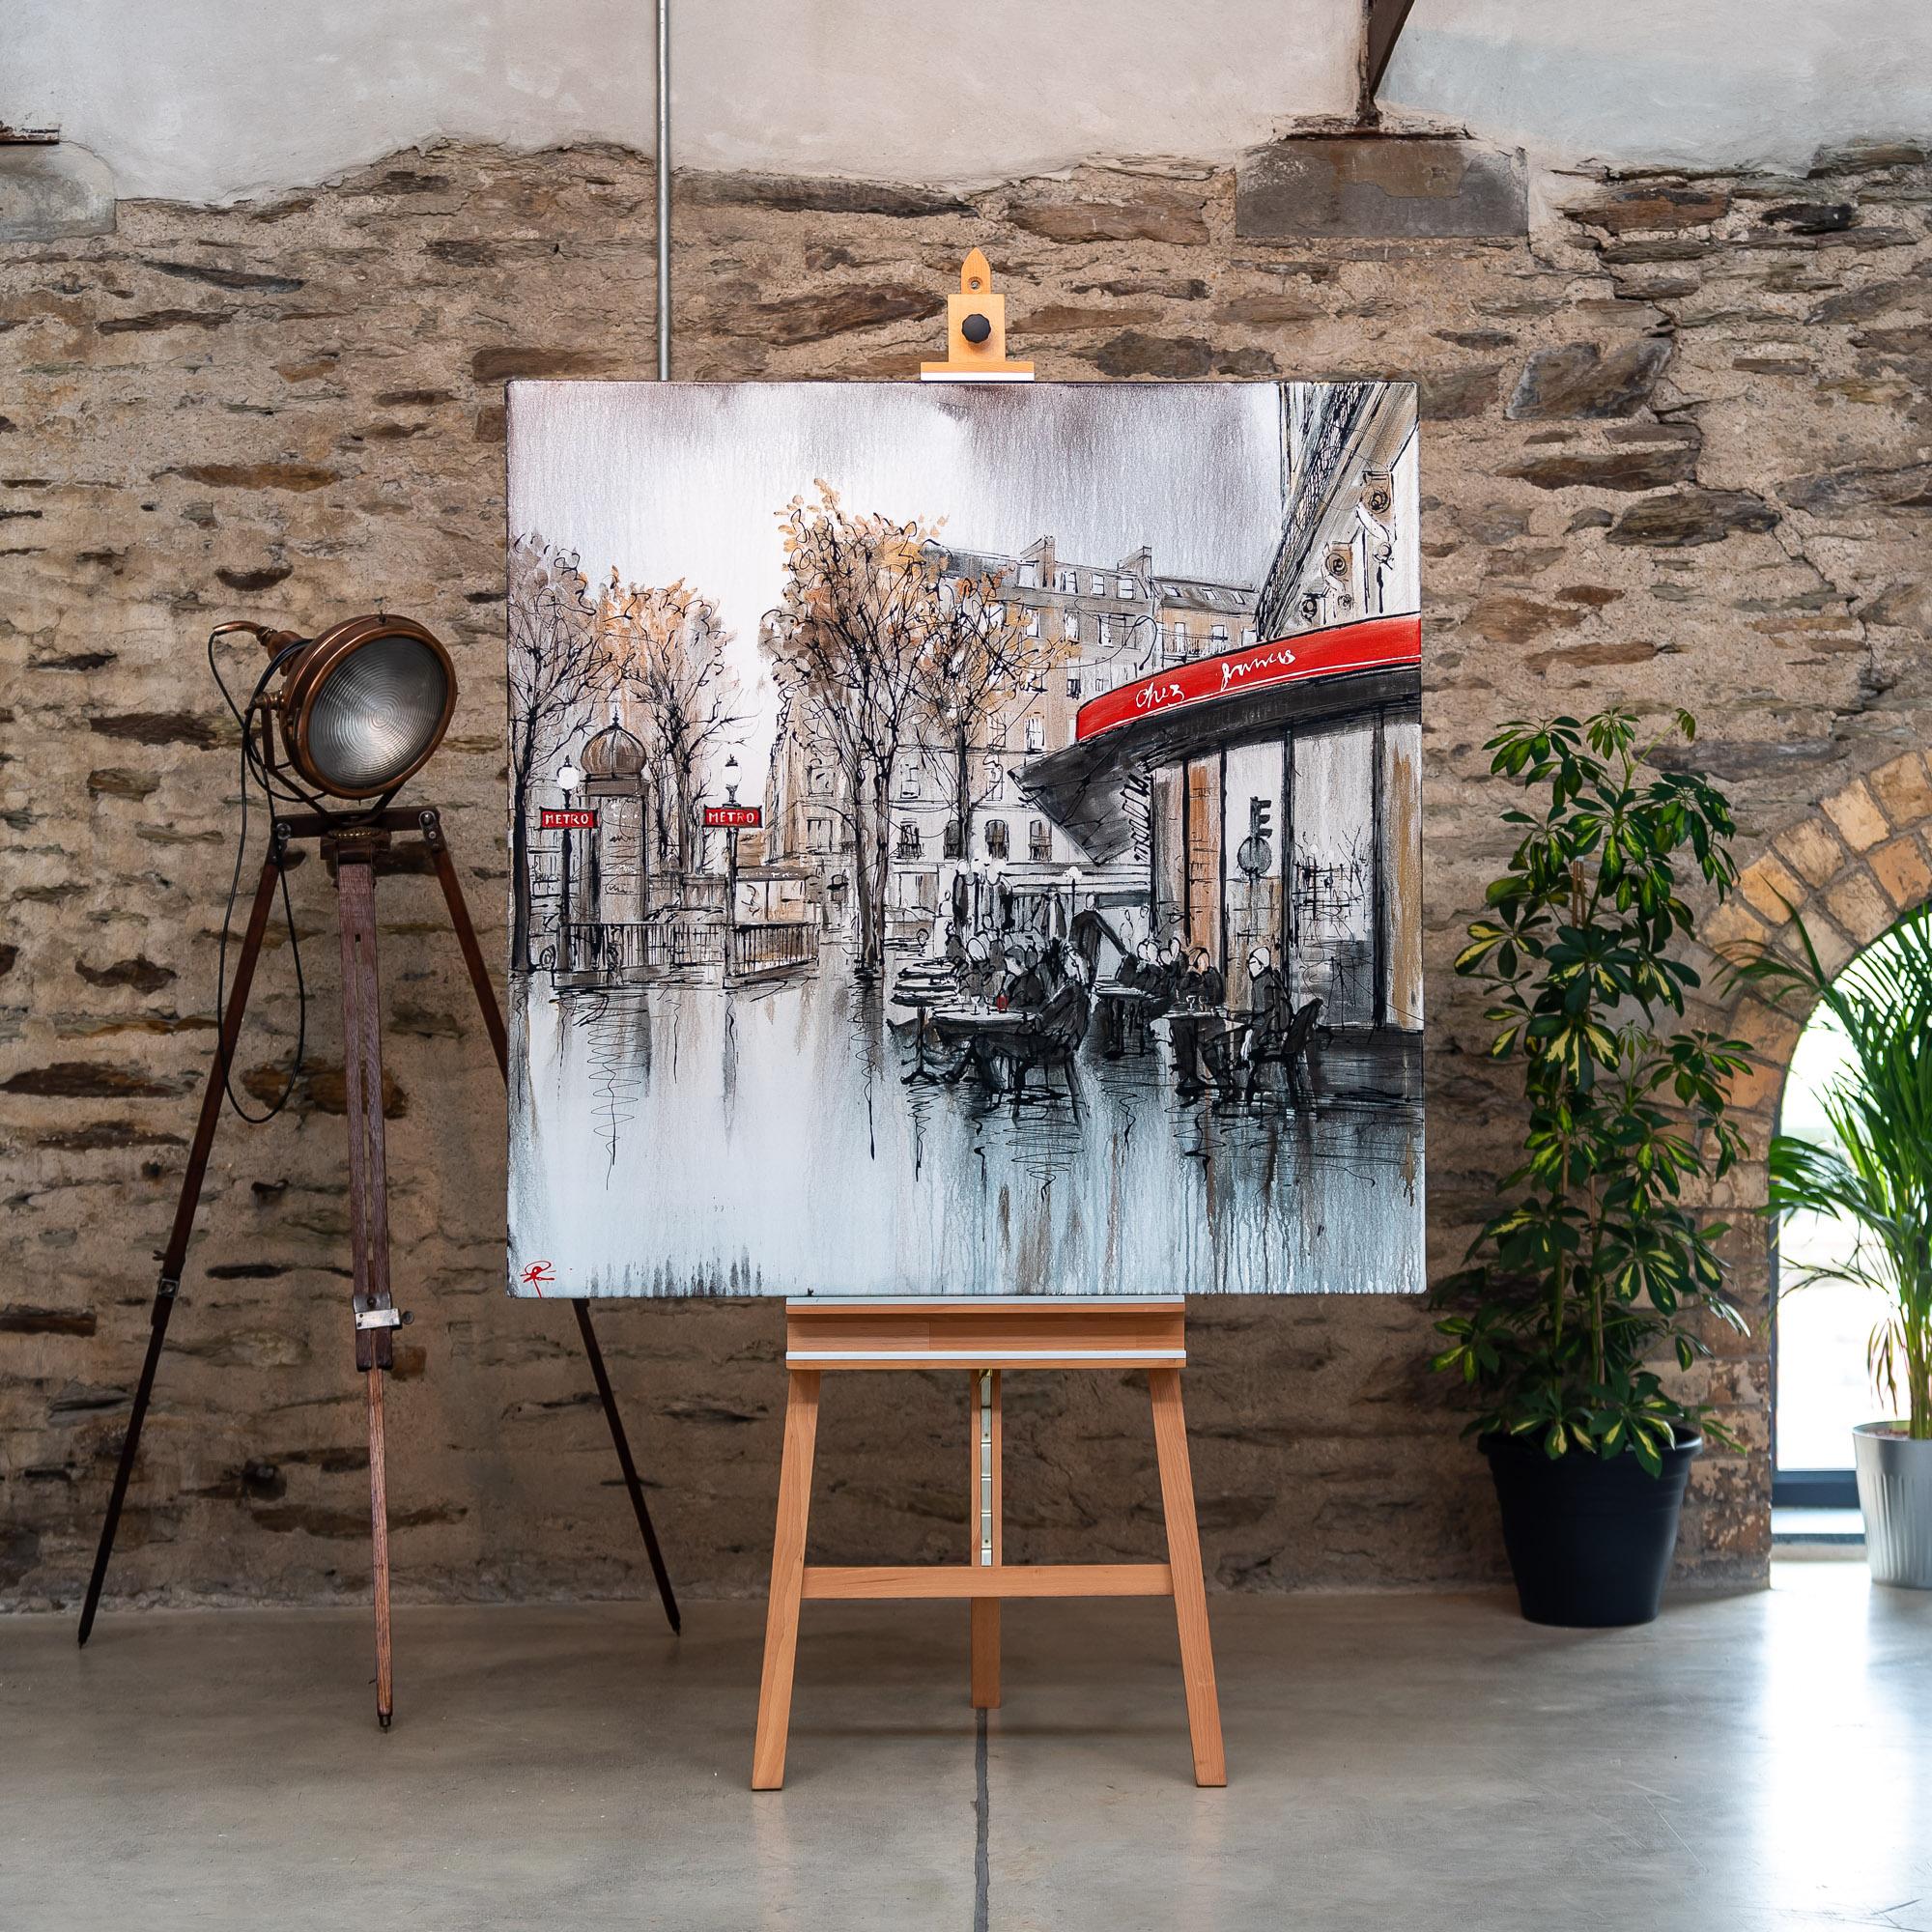 Parisian Life by Paul Kenton, UK contemporary cityscape artist, an original painting from his Paris Collection